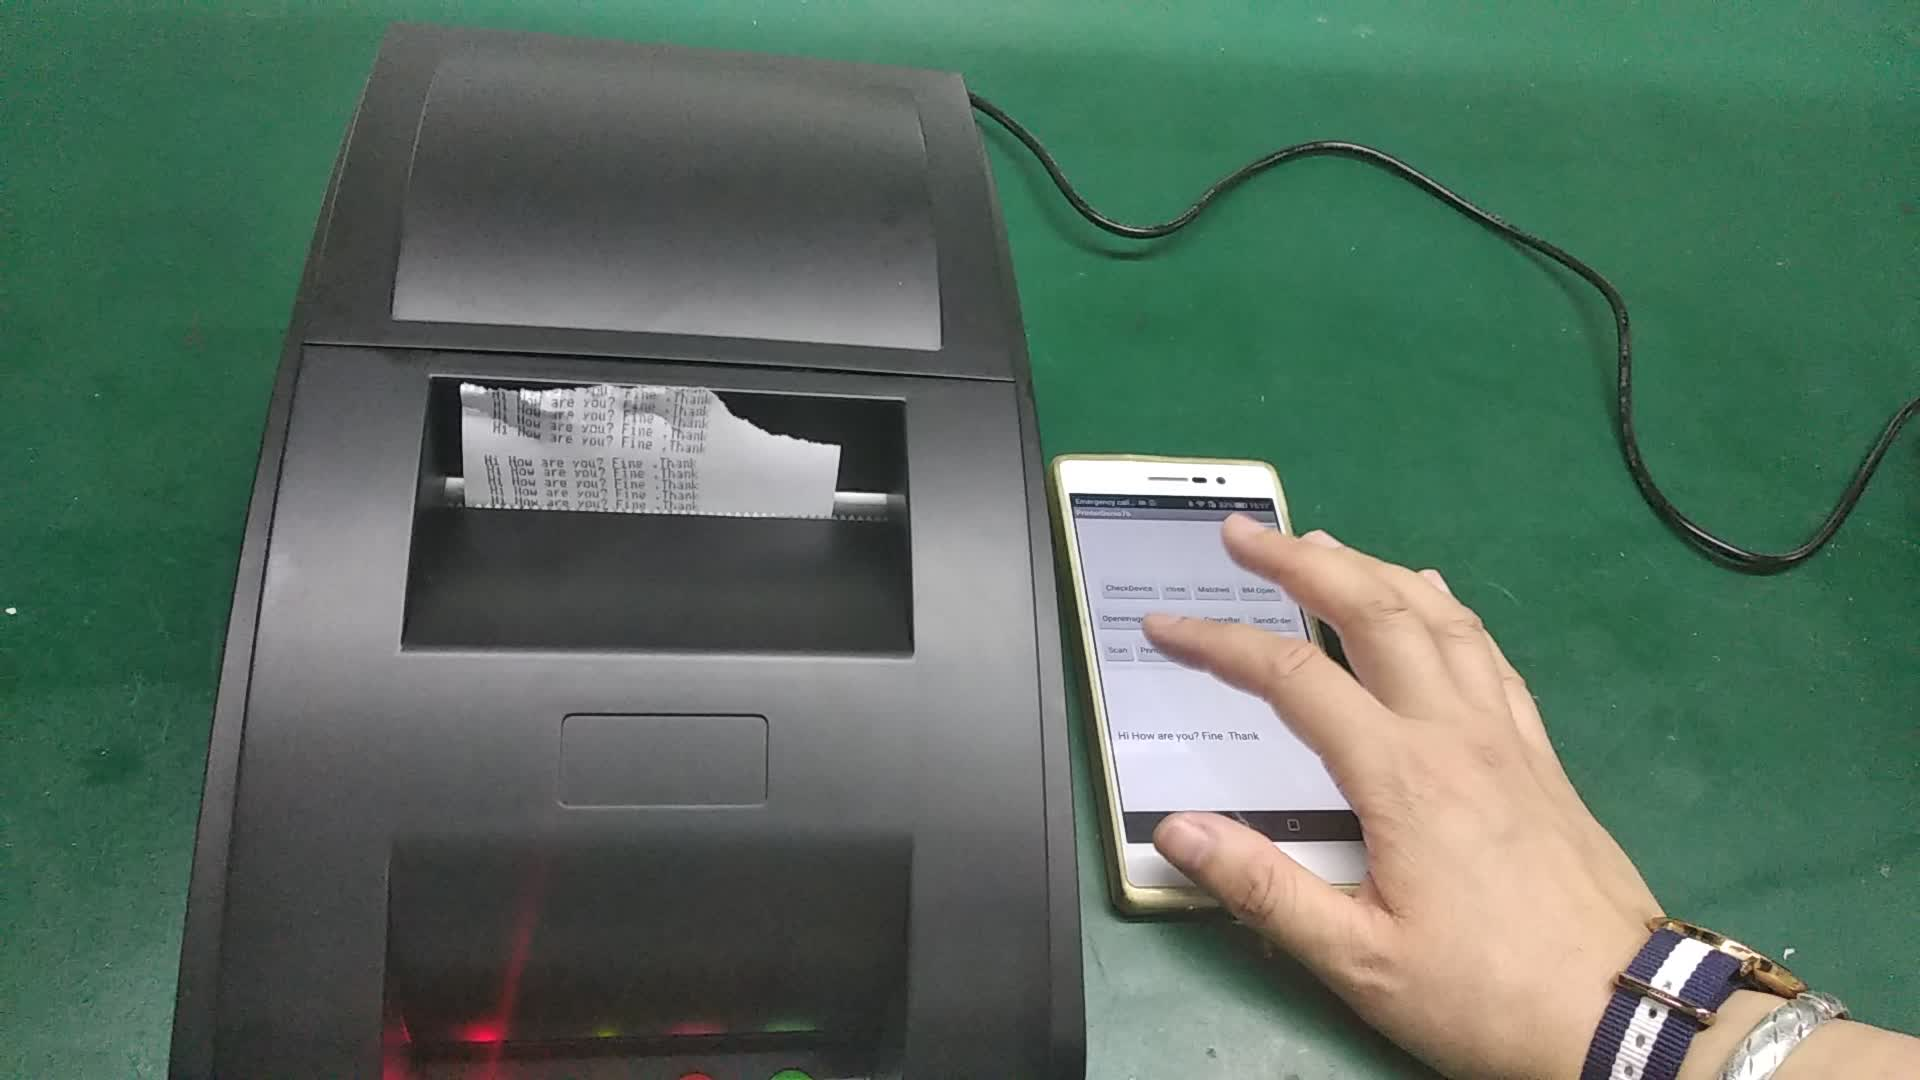 Desktop di QS 7601 76mm dot matrix bluetooth stampante di ricevute mobile di sostegno 127 dpi